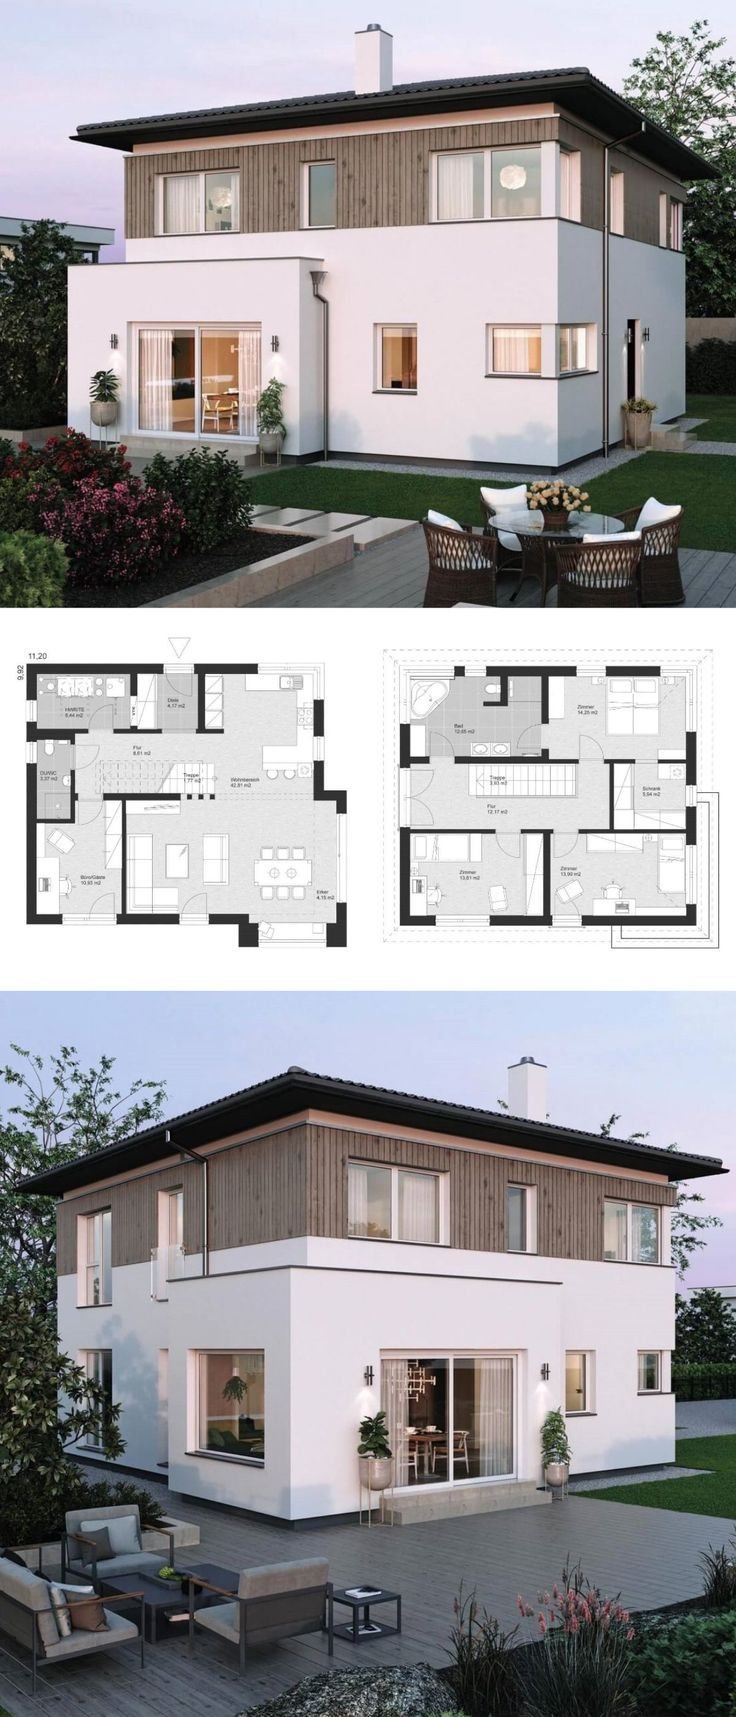 #hausbaudirektde #einfamilienhaus #architektur #stadtvilla #fertighaus